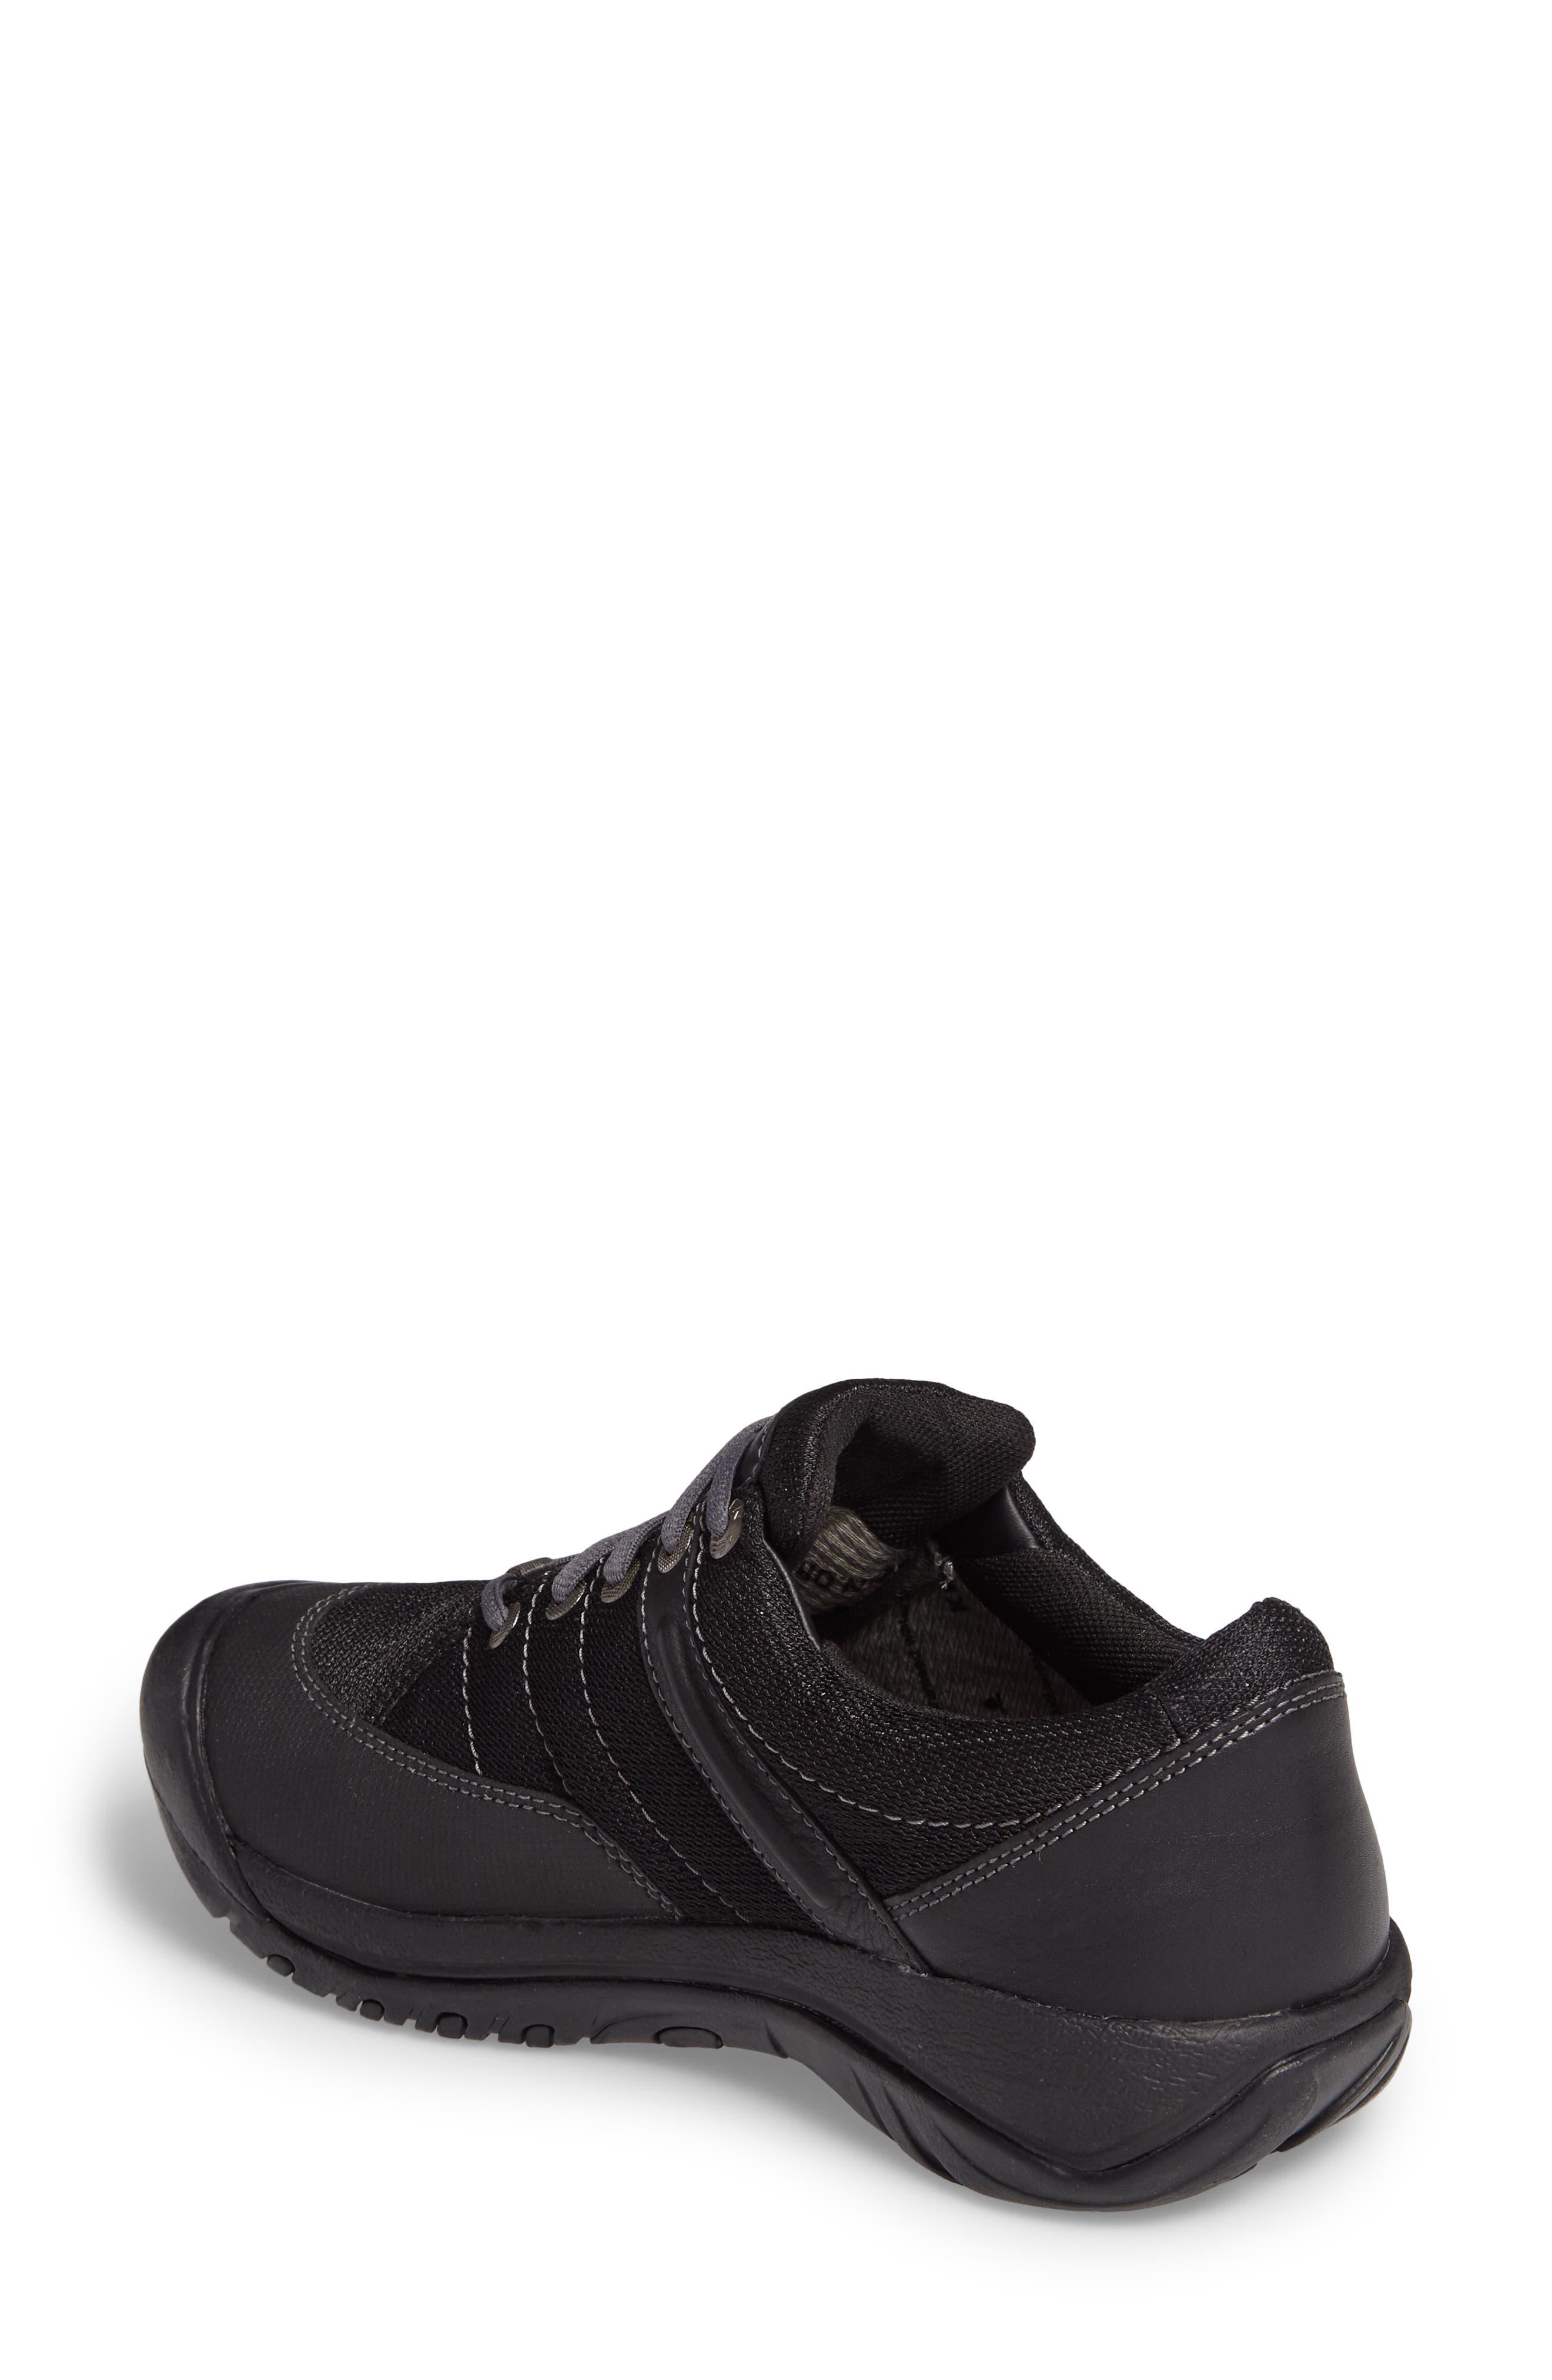 Presidio Waterproof Sport Sneaker,                             Alternate thumbnail 2, color,                             BLACK LEATHER